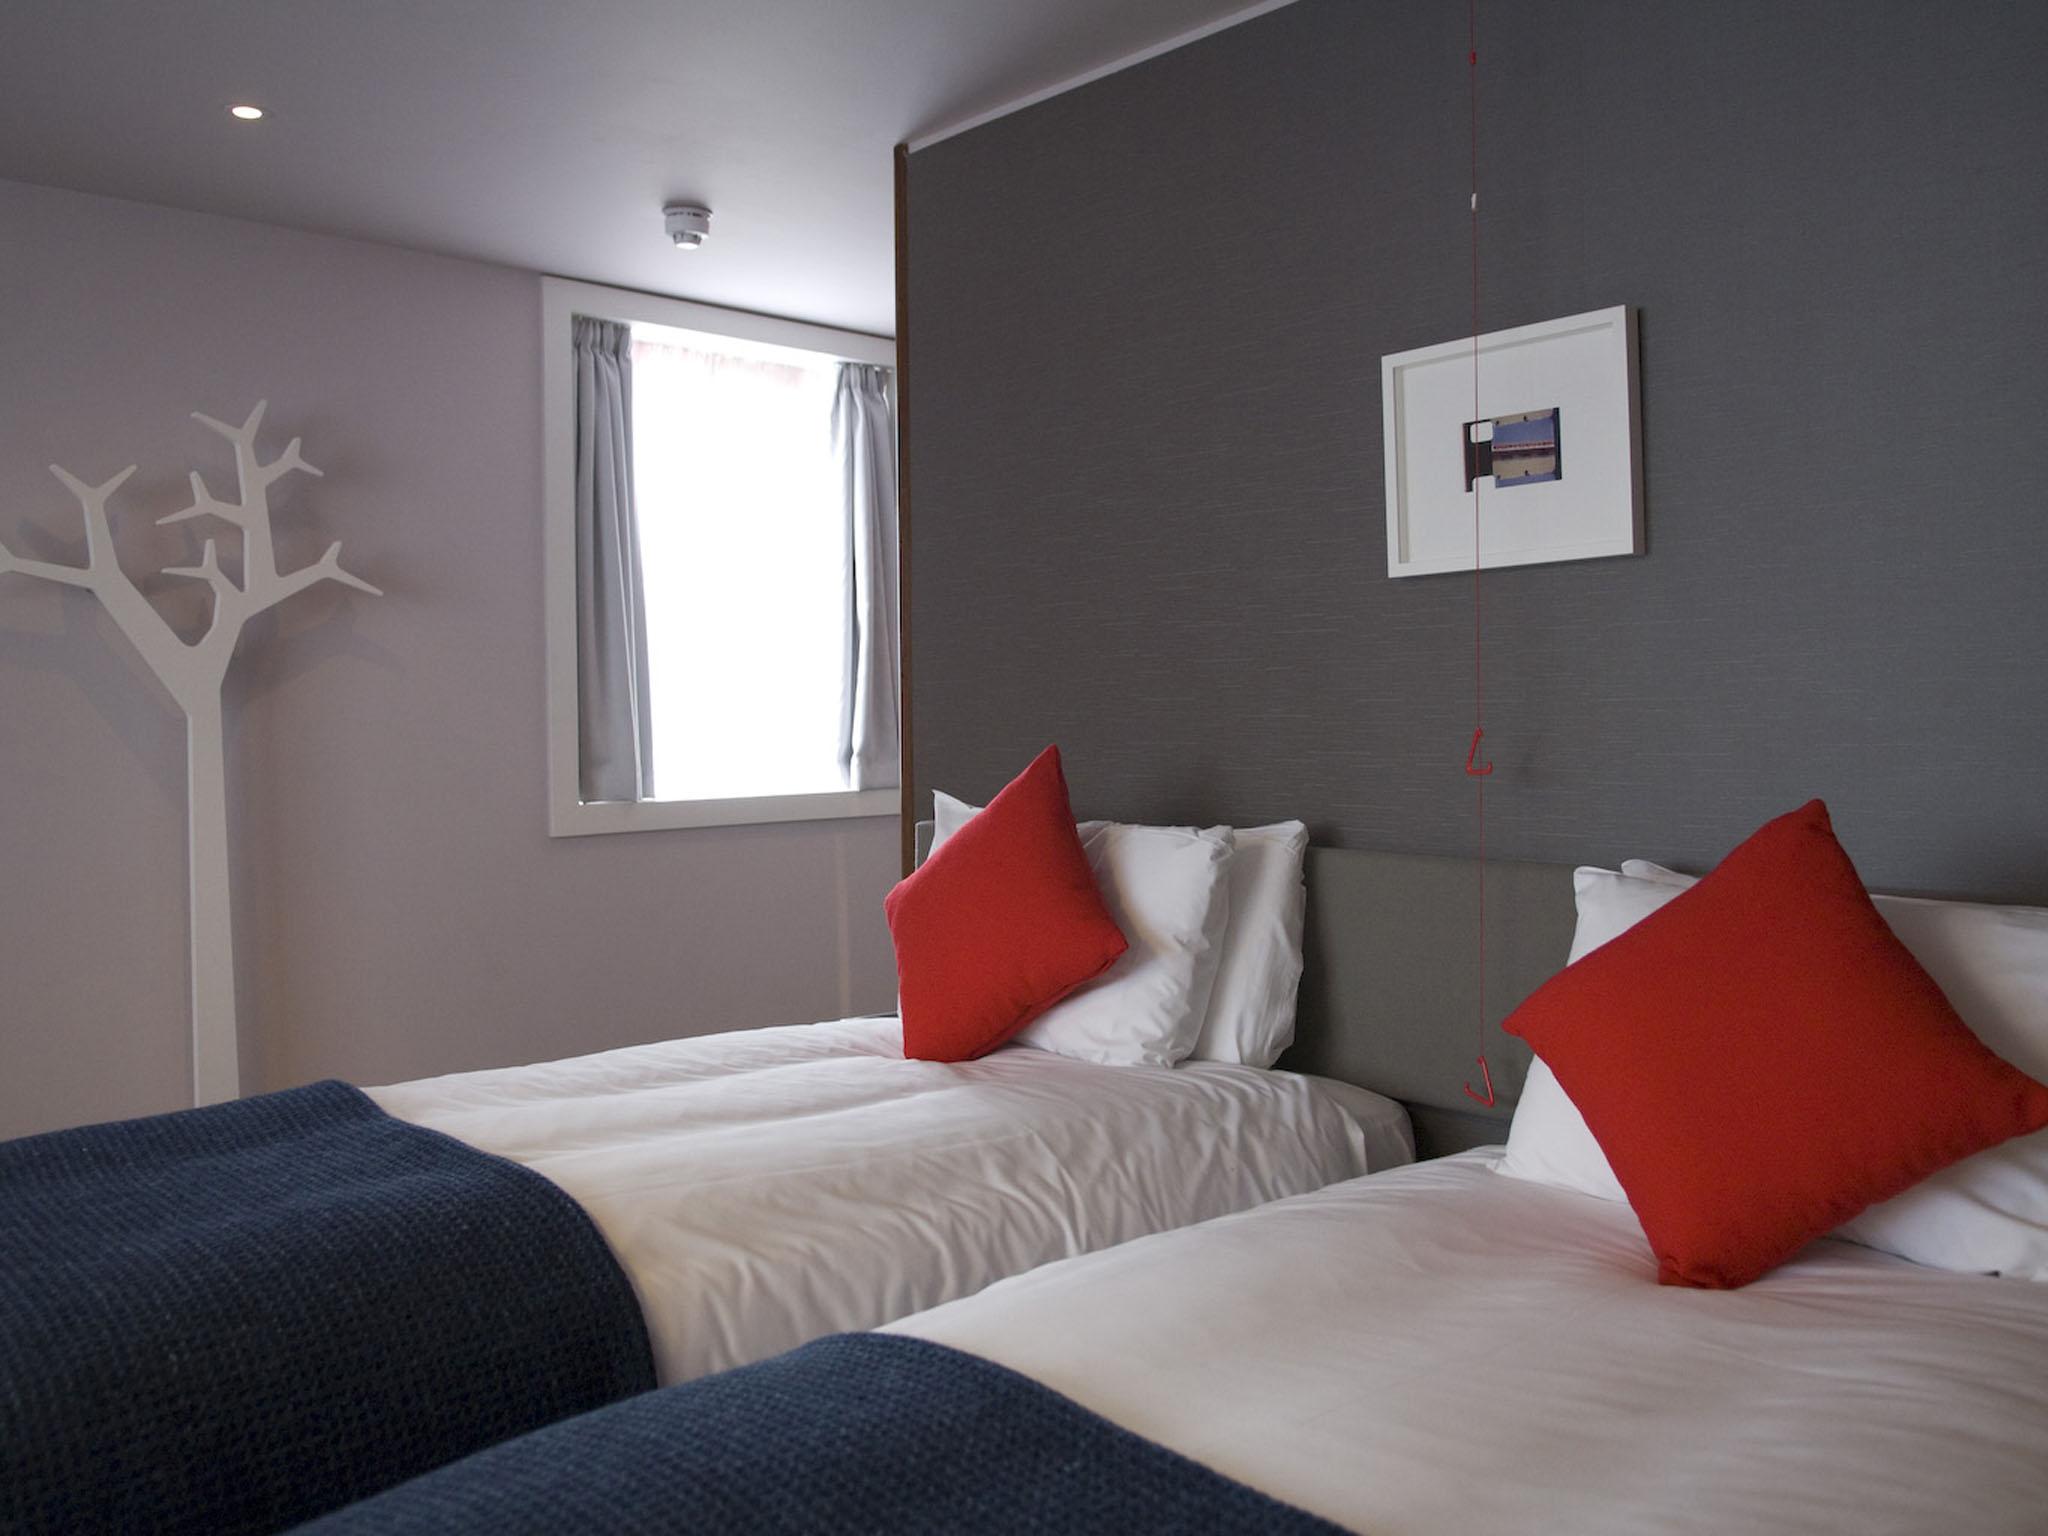 Midland Hotel Bedroom 1